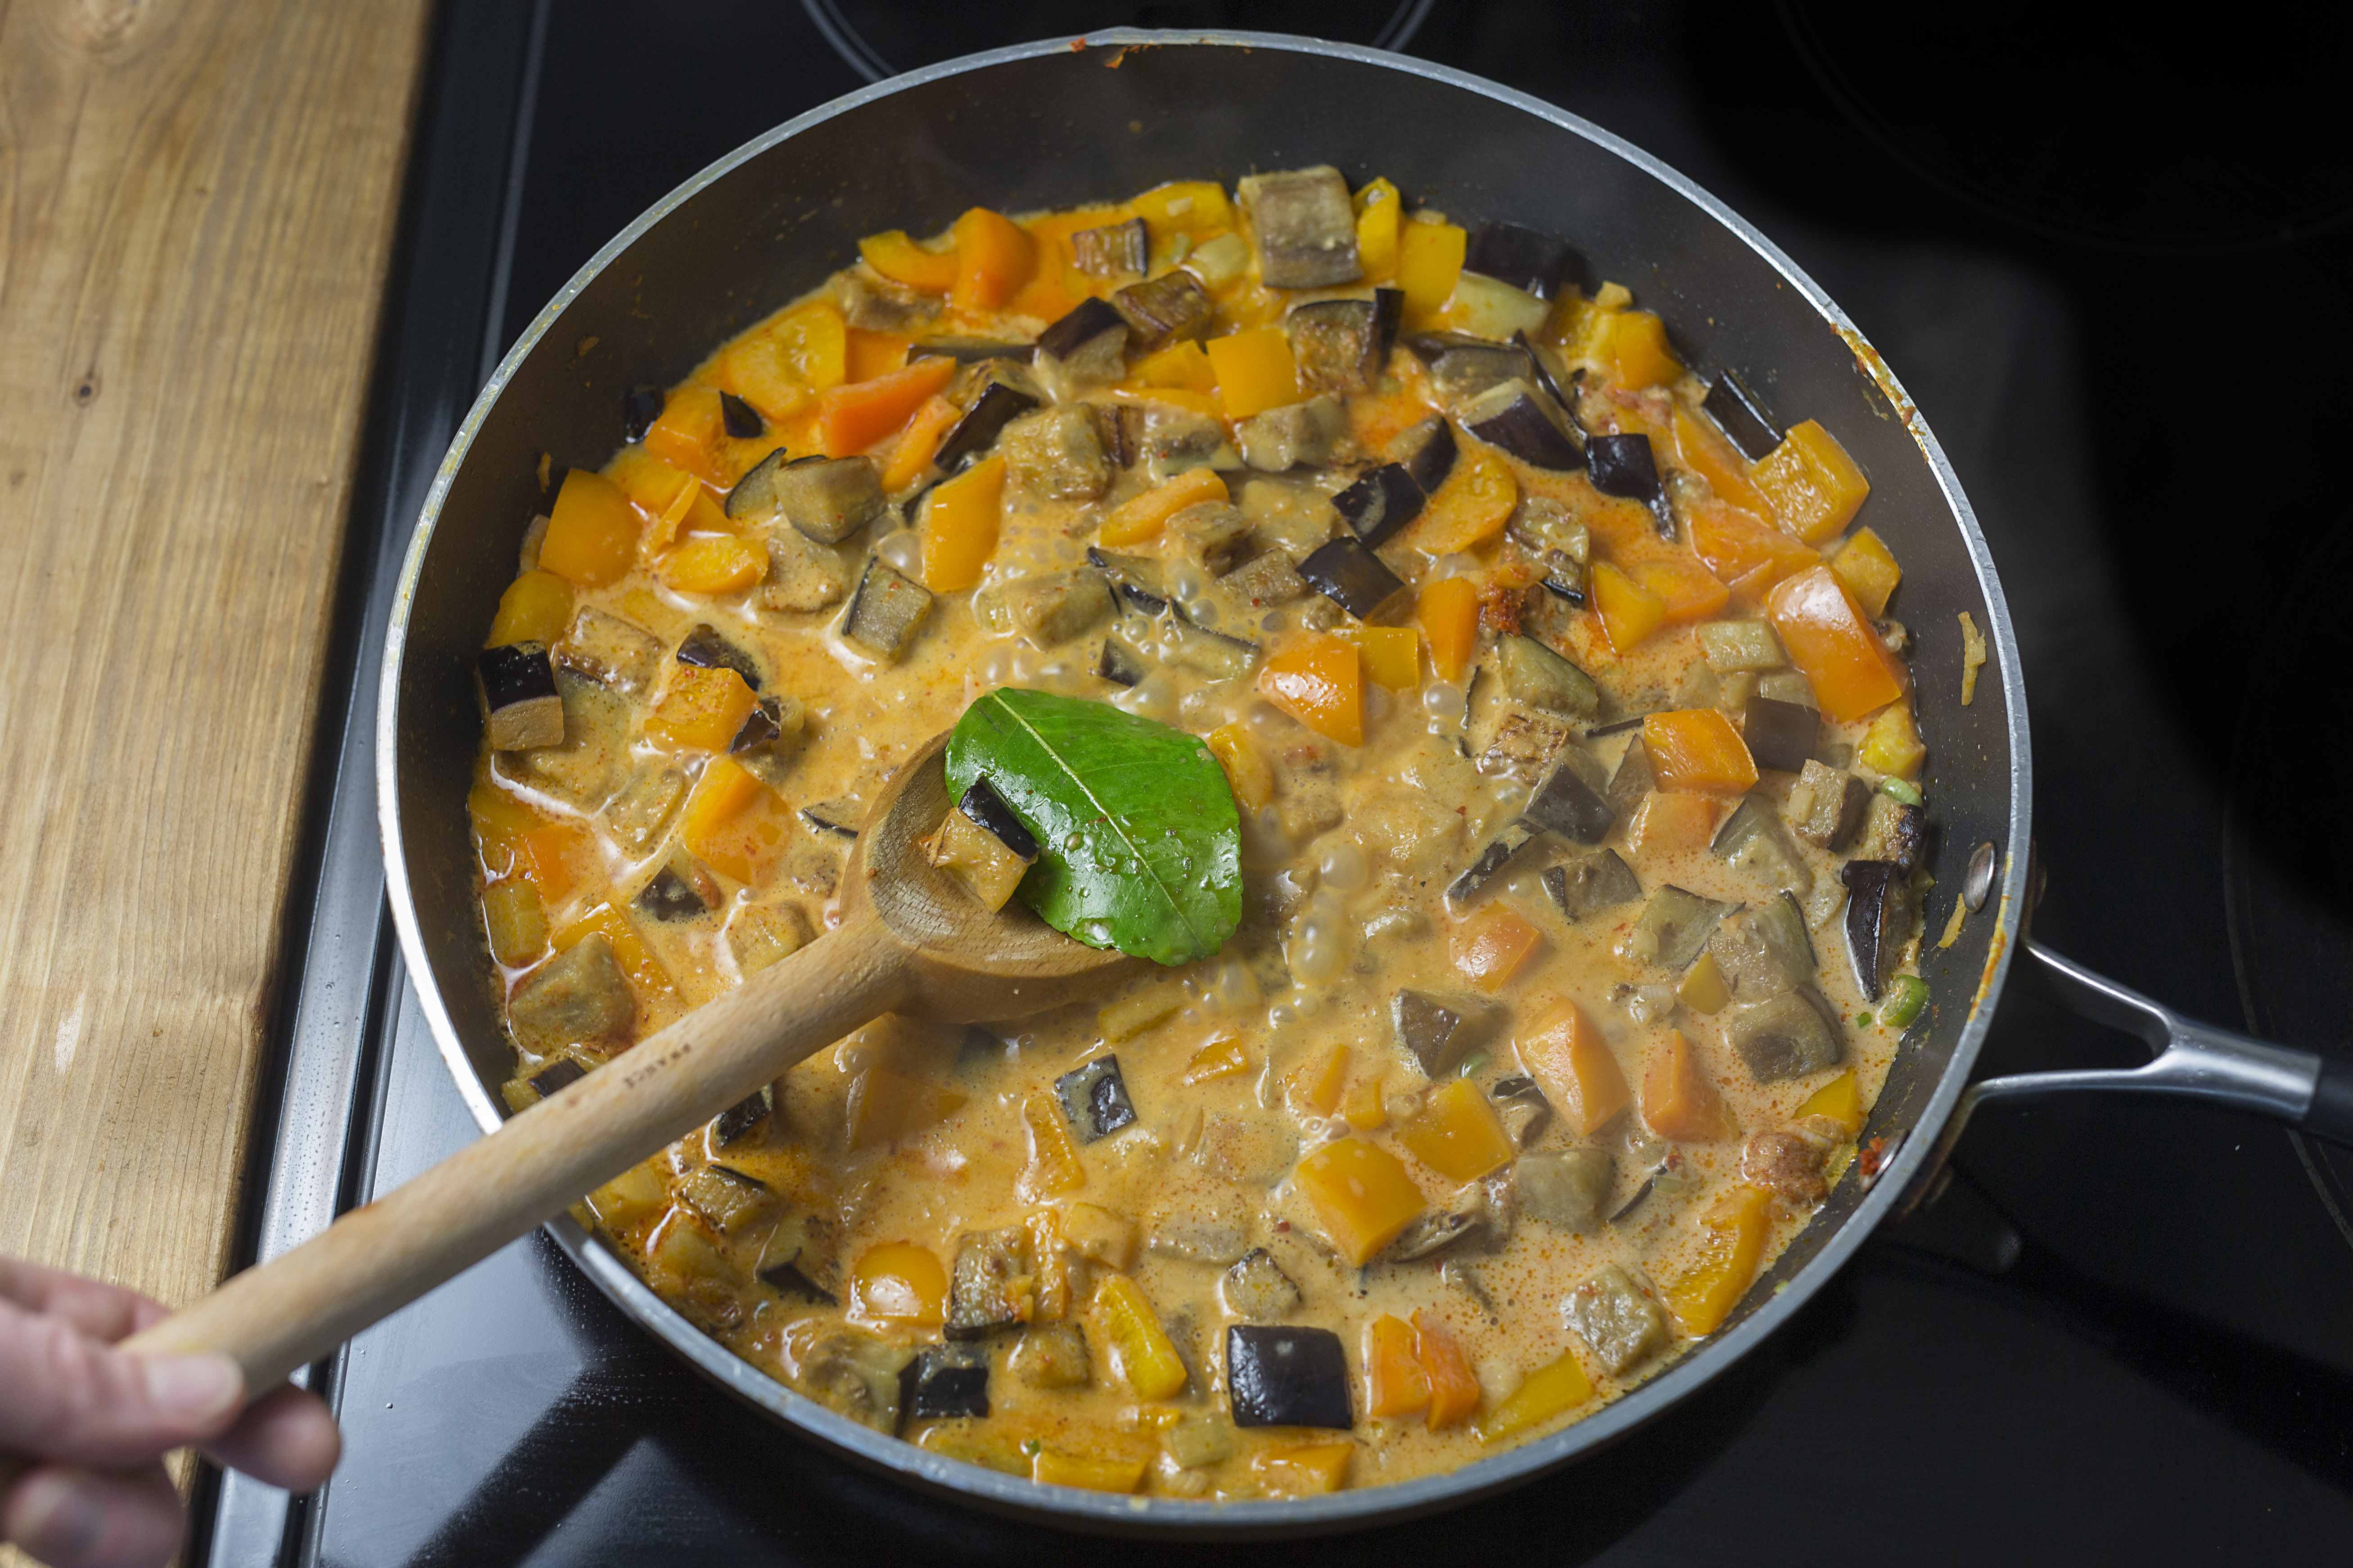 curry d aubergine la tha landaise avec riz basmati. Black Bedroom Furniture Sets. Home Design Ideas